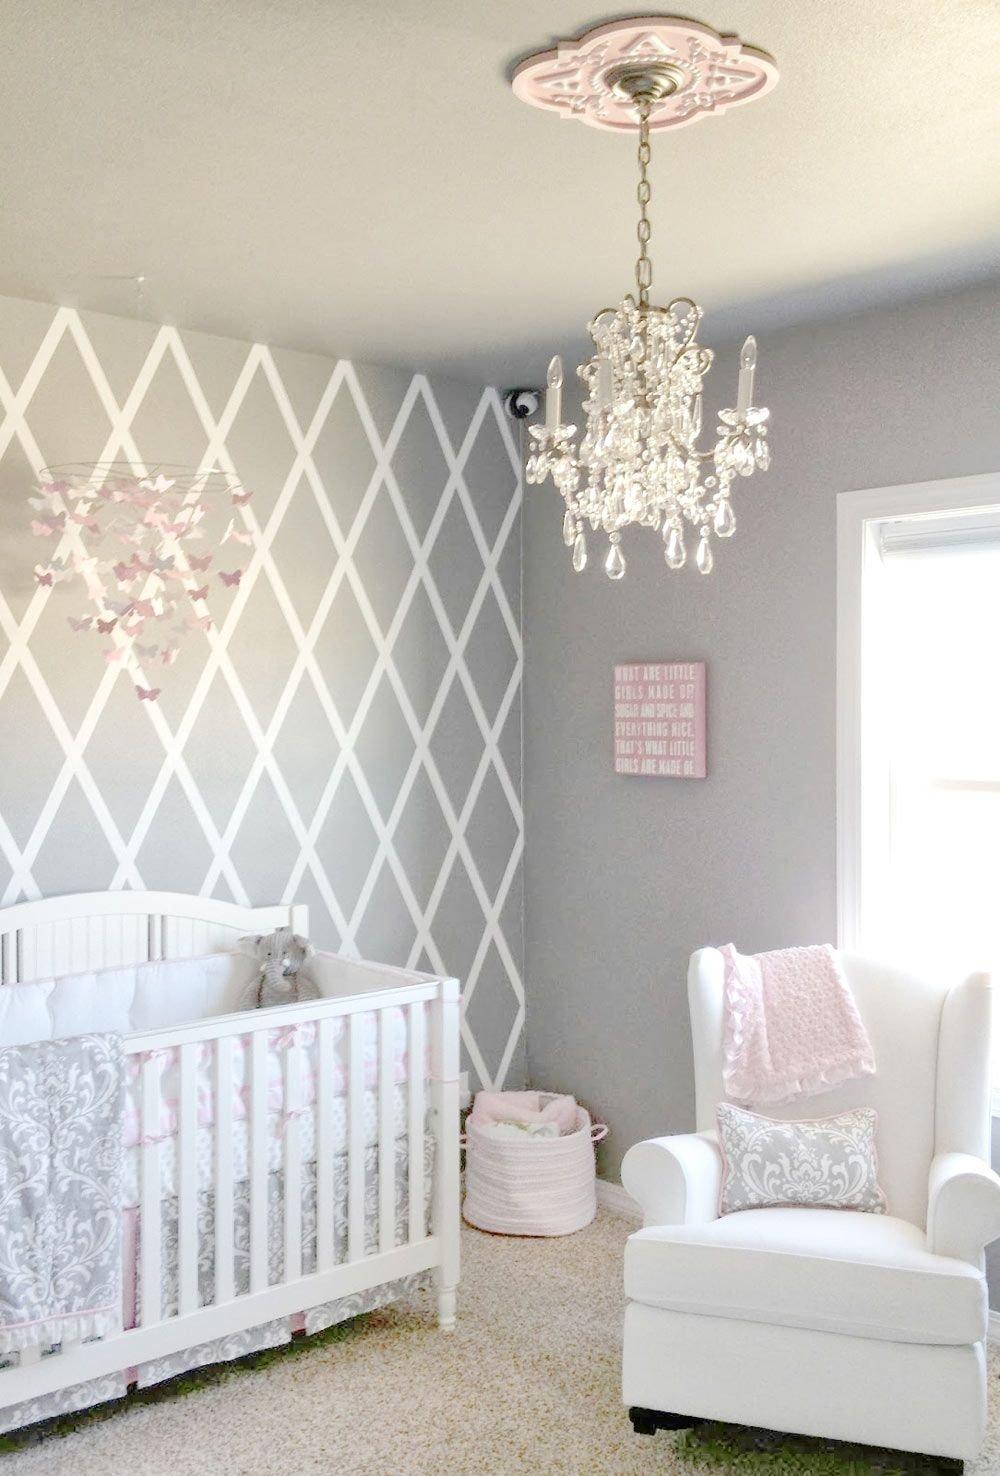 10 Stunning Pinterest Baby Girl Nursery Ideas pink and gray crib bedding sets baby girl nursery baby nursery 2021